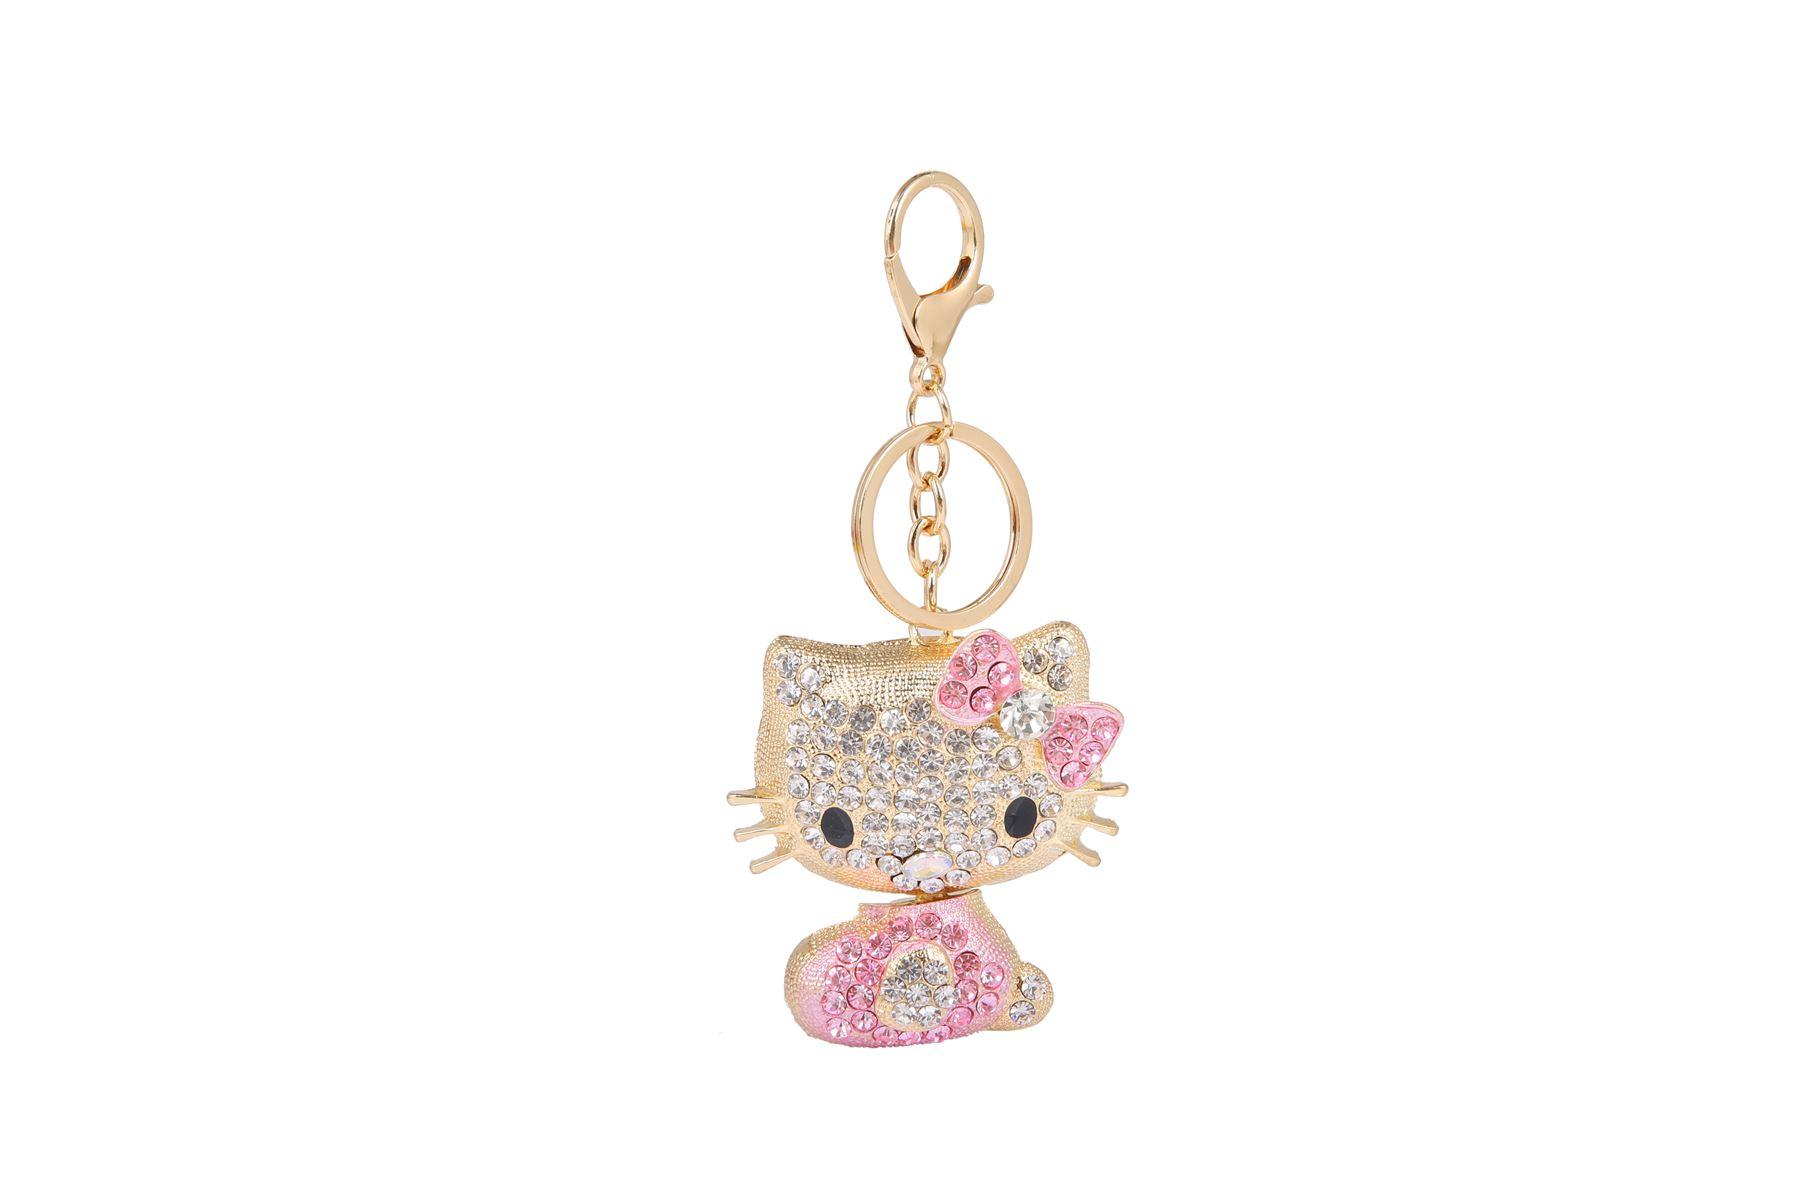 Key-Ring-Bag-Charm-Anime-Character-Rhinestone-Crystal-CZ-Keyring-Keychain-Gift thumbnail 13